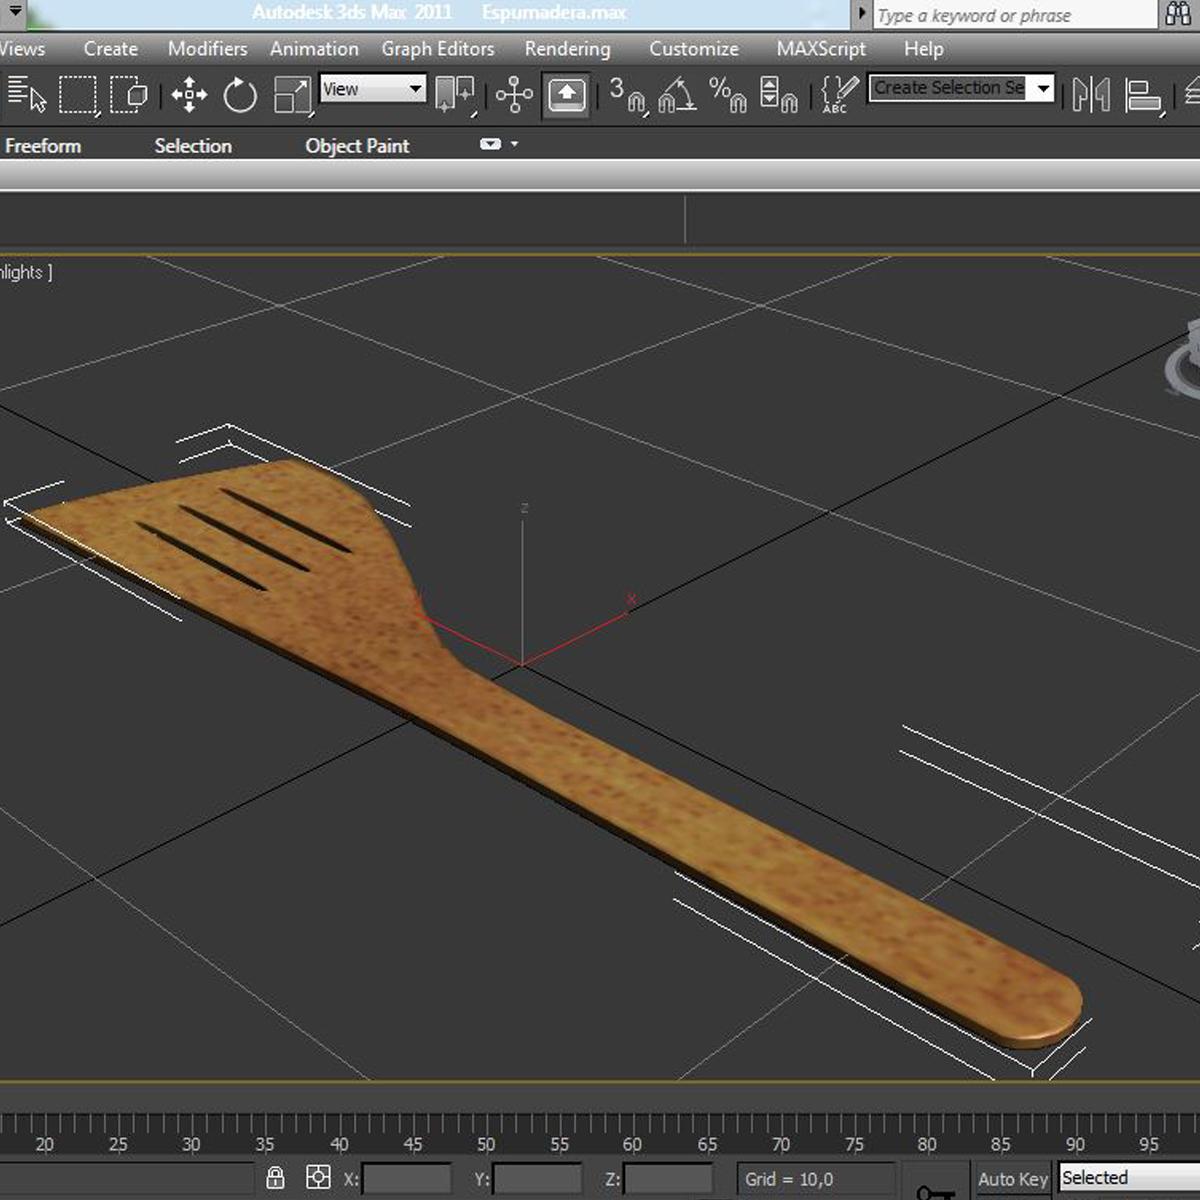 slotted spoon 3d model max fbx c4d ma mb obj 159288